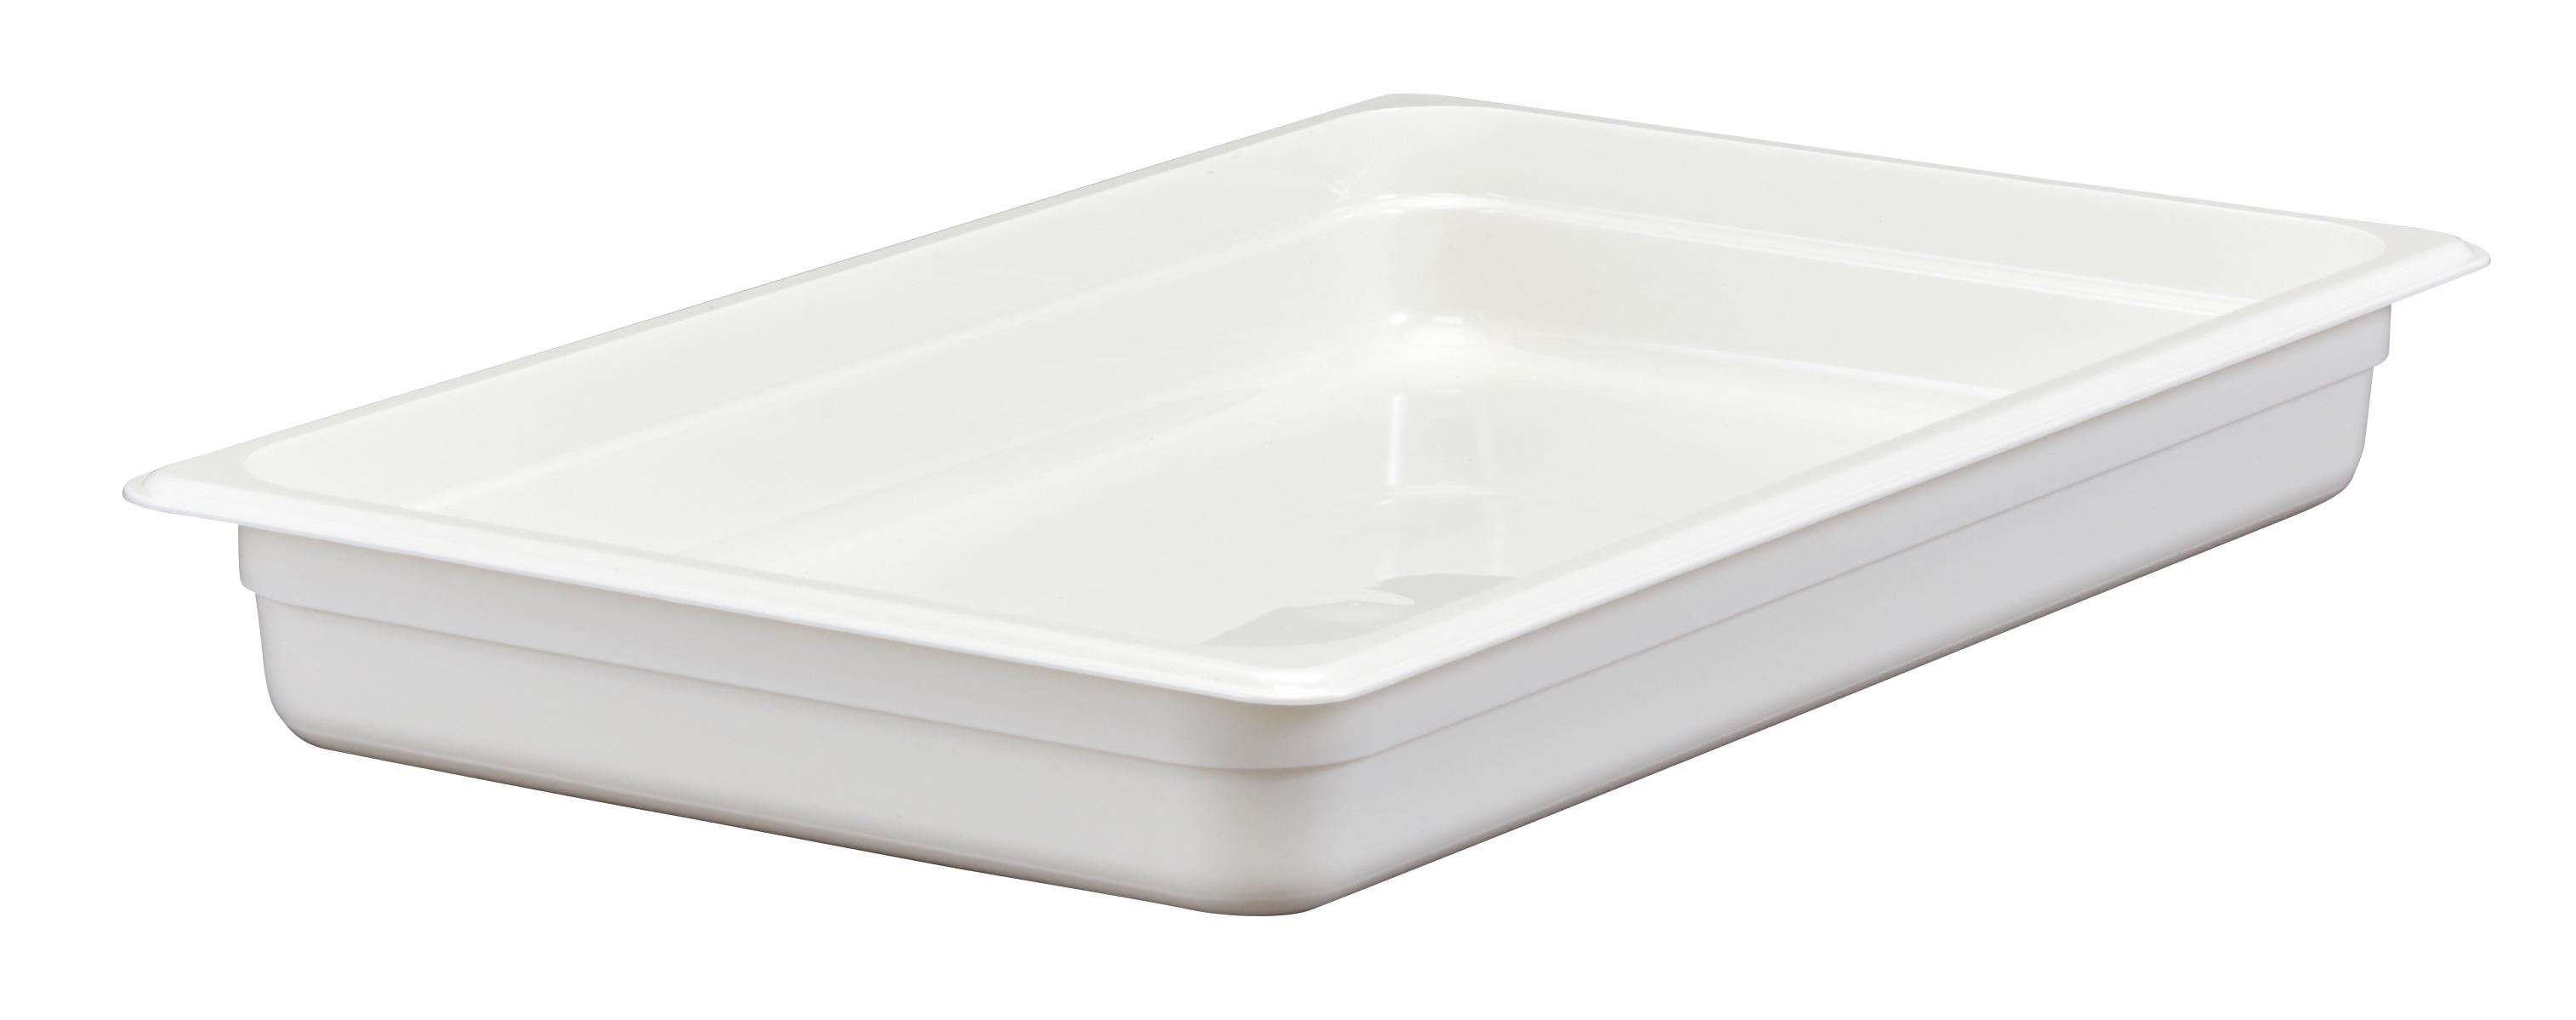 Cambro 12CW148 food/beverage storage container